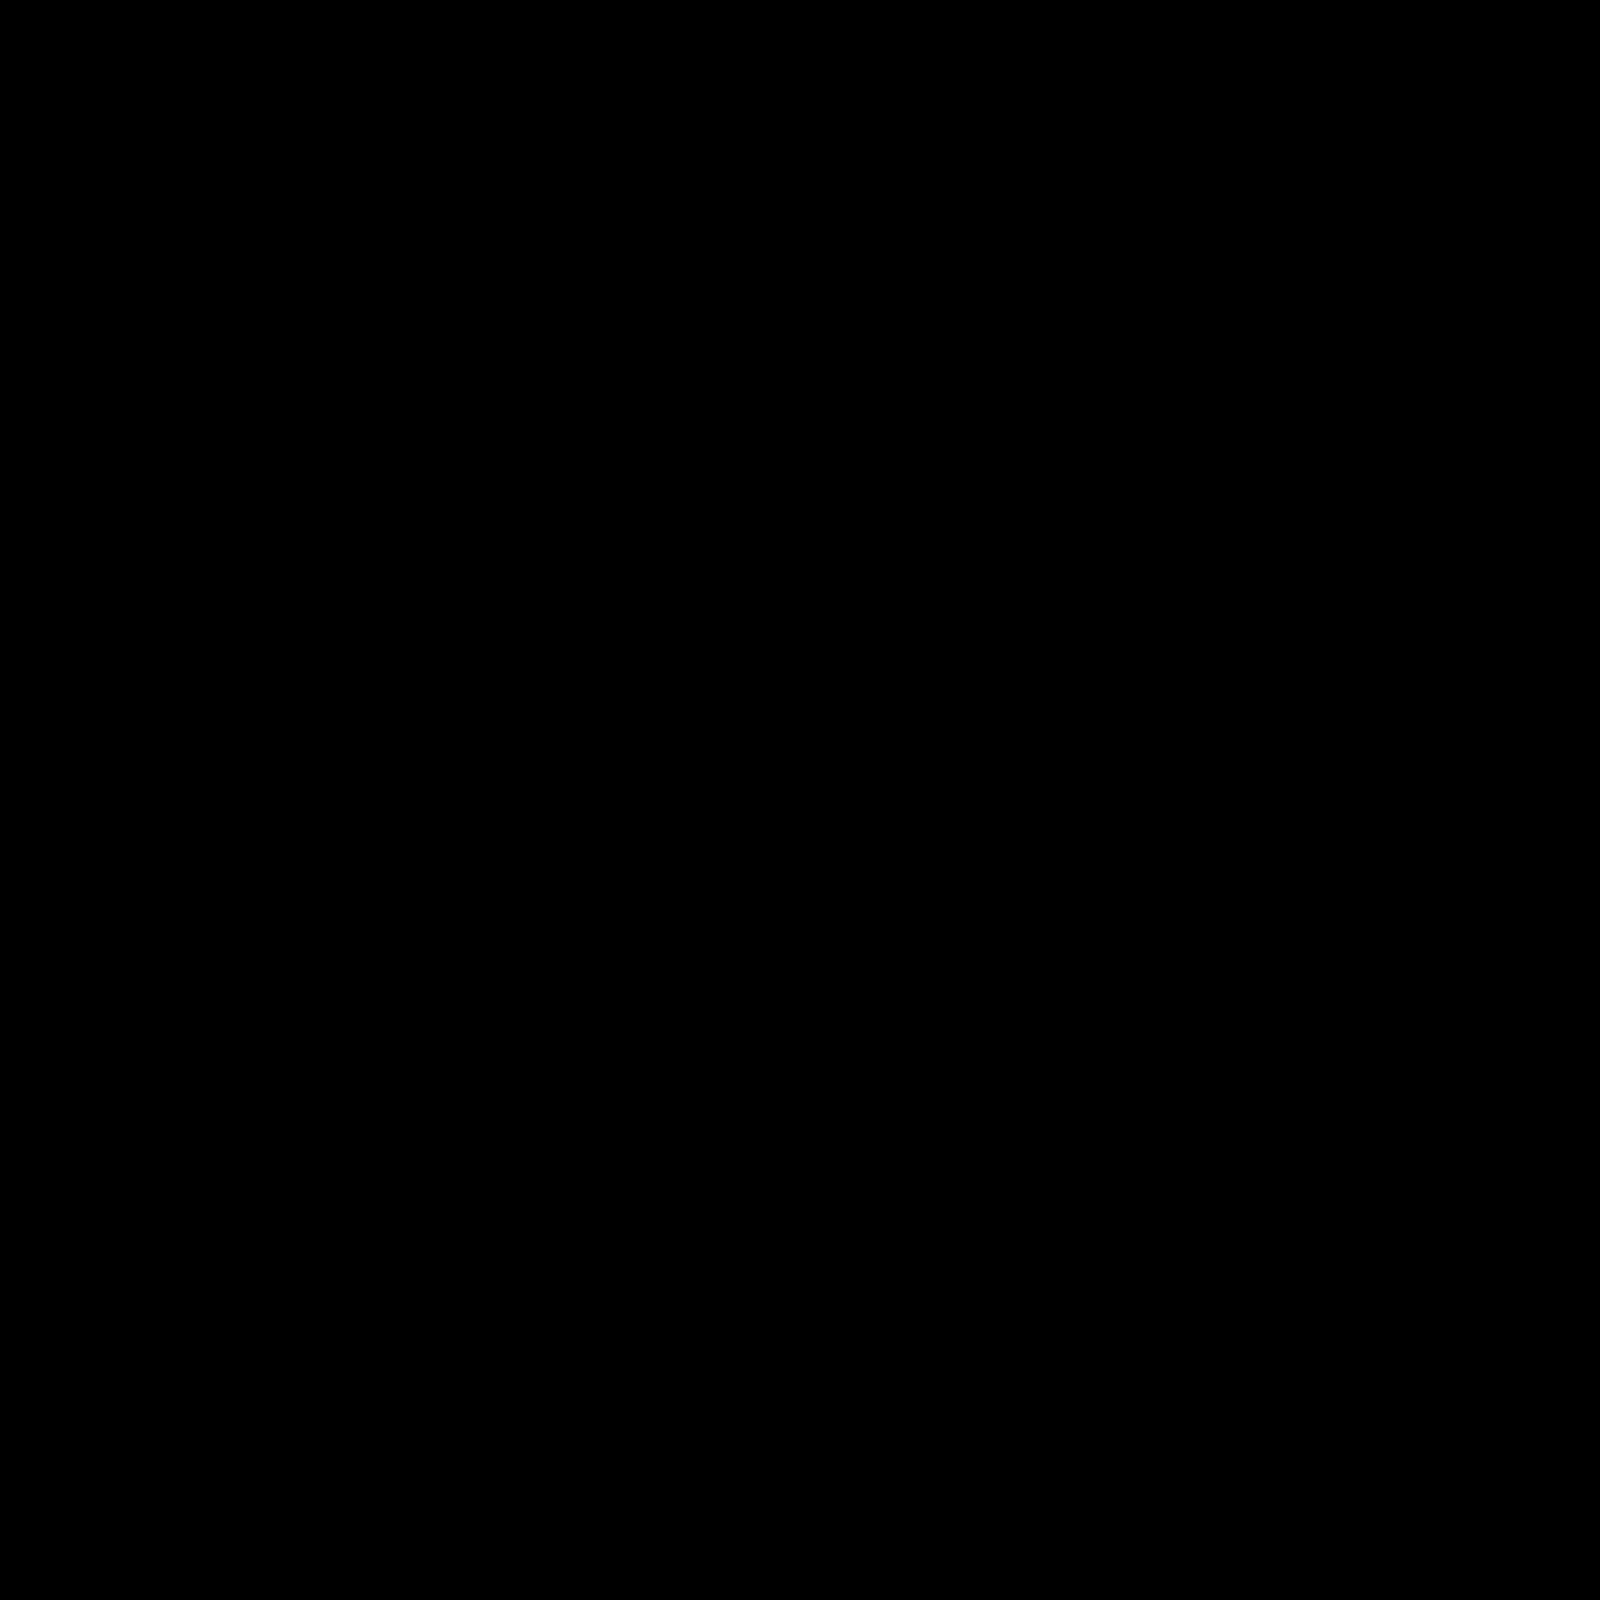 Subscription icon